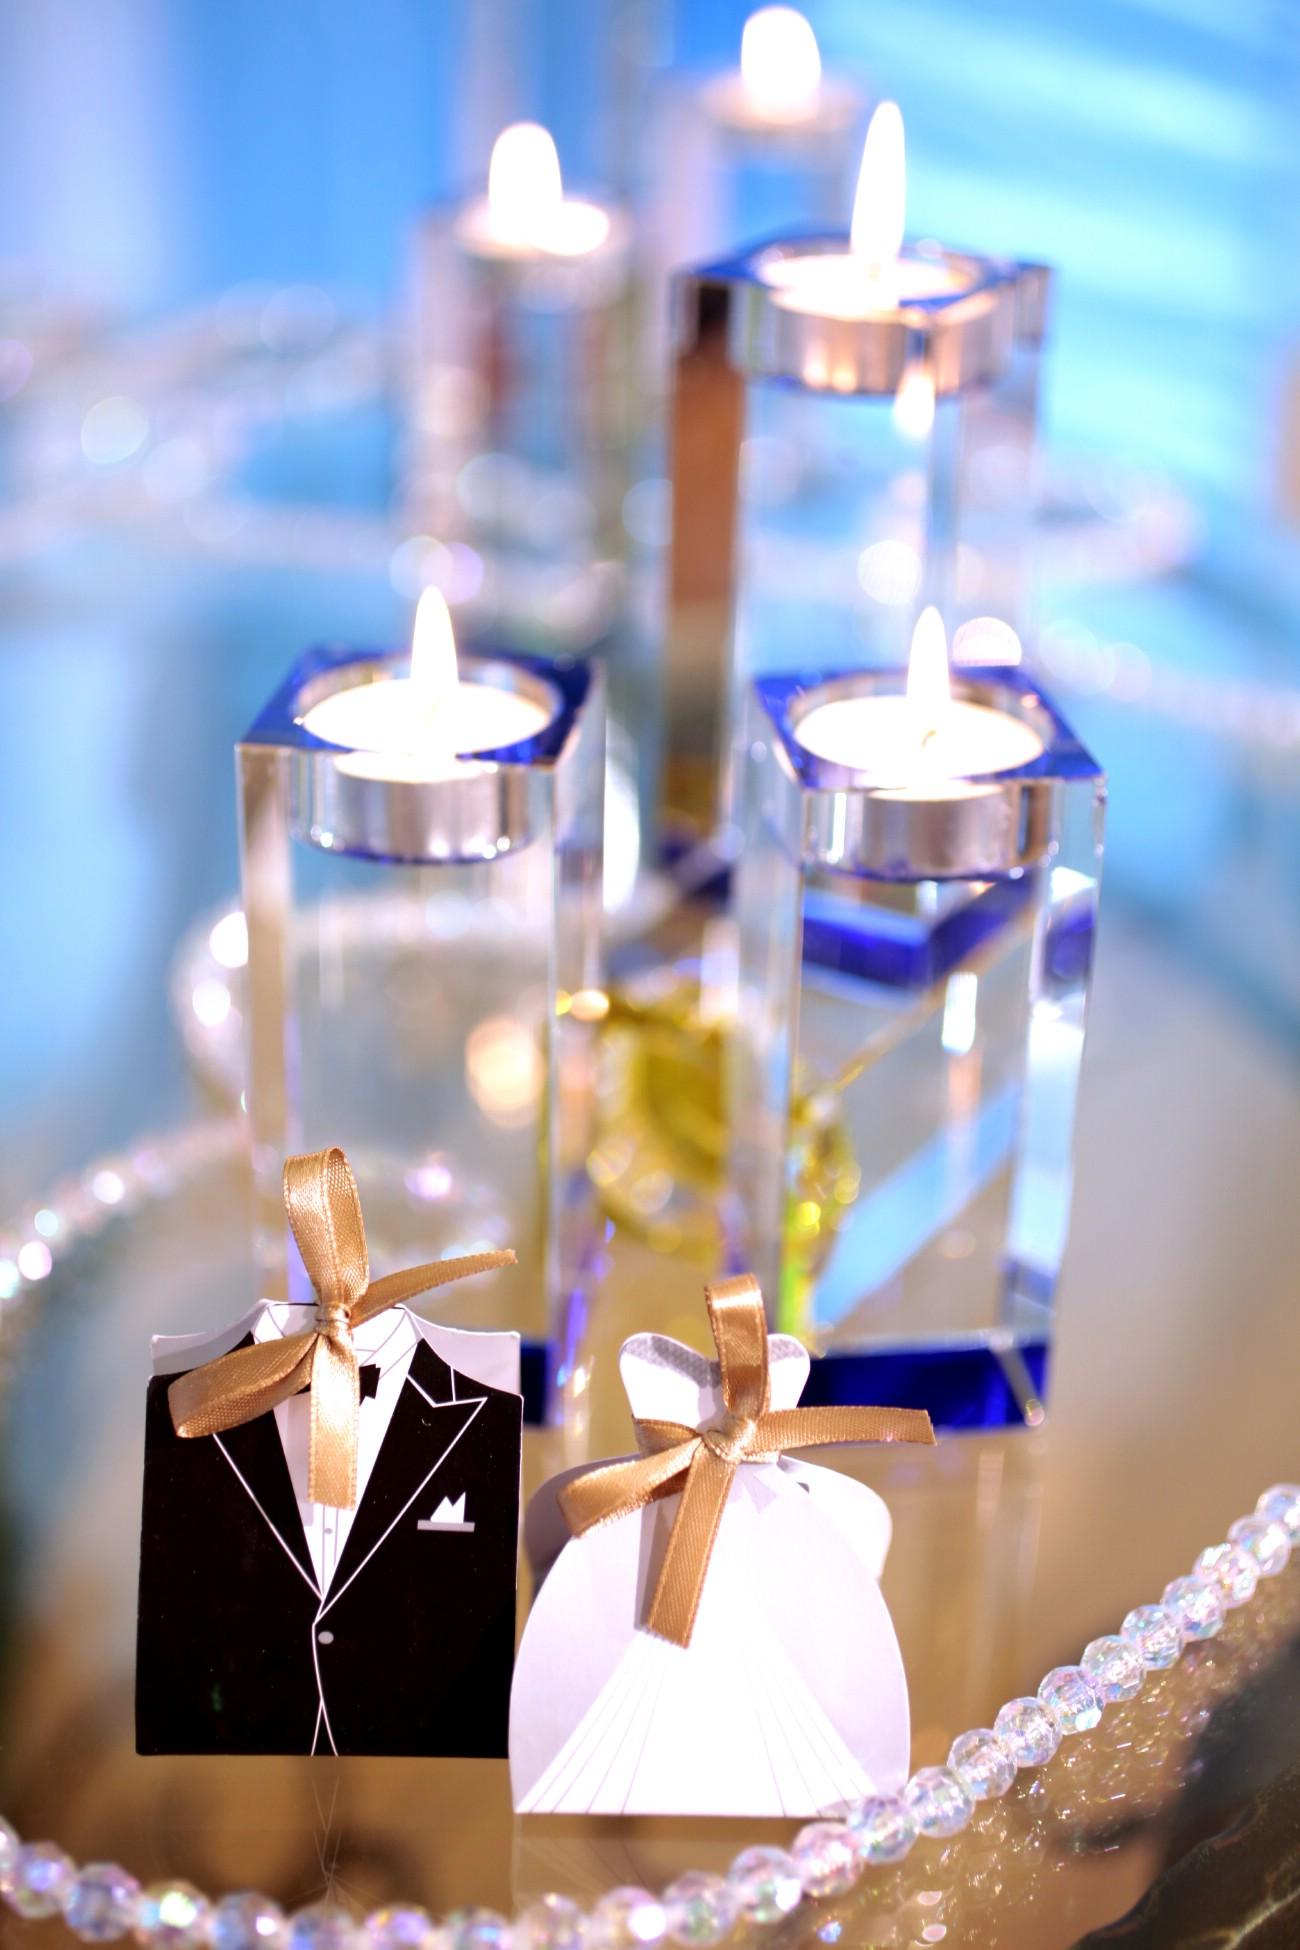 Lễ hội đám cưới